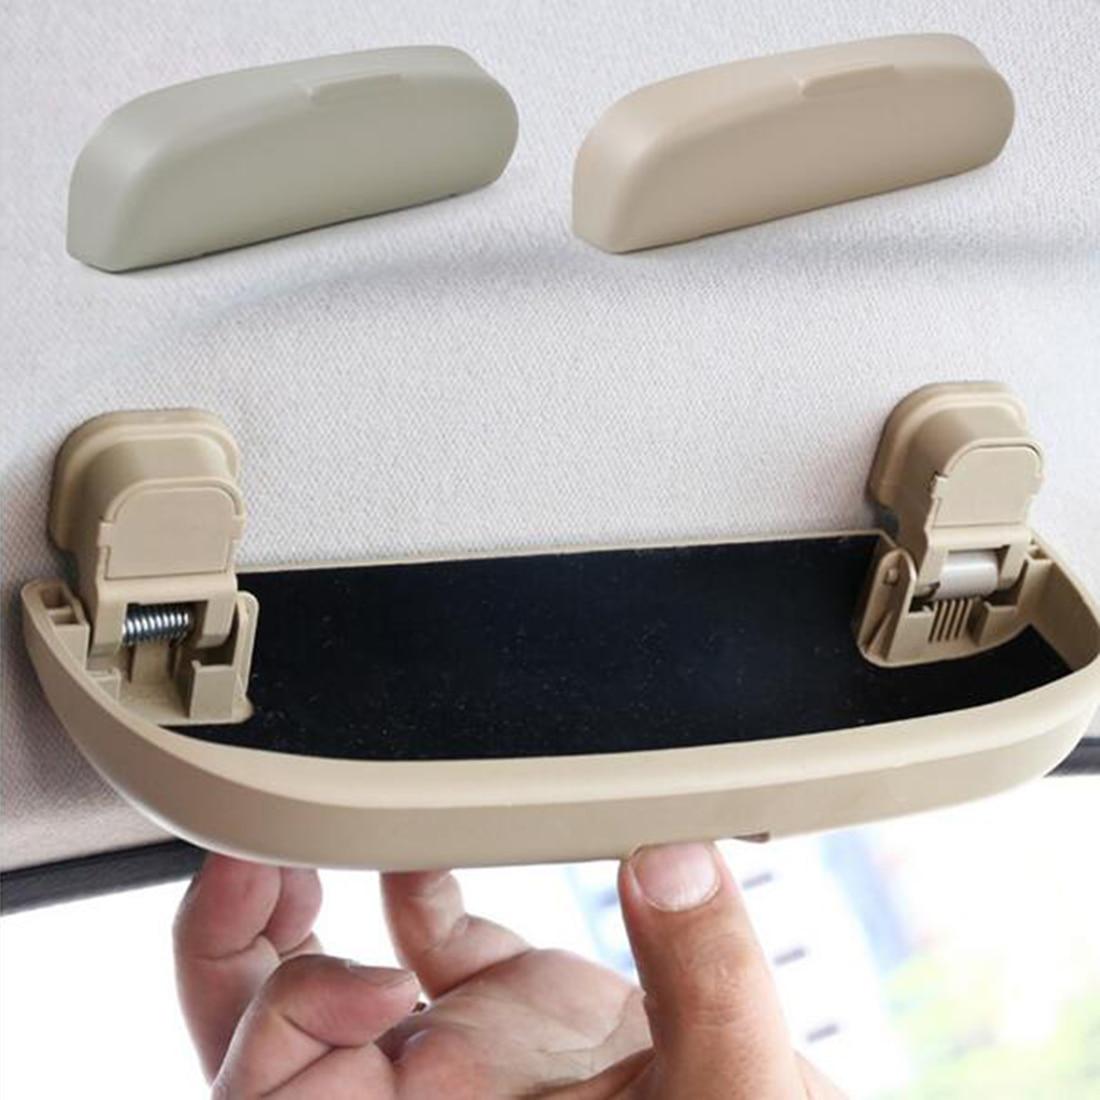 Dewtreetali 2018 Venda Quente Autos Caixa De Armazenamento De Óculos De Sol Óculos Titular Caso Caixa Para Jeep Renegade 2014 2015 2016